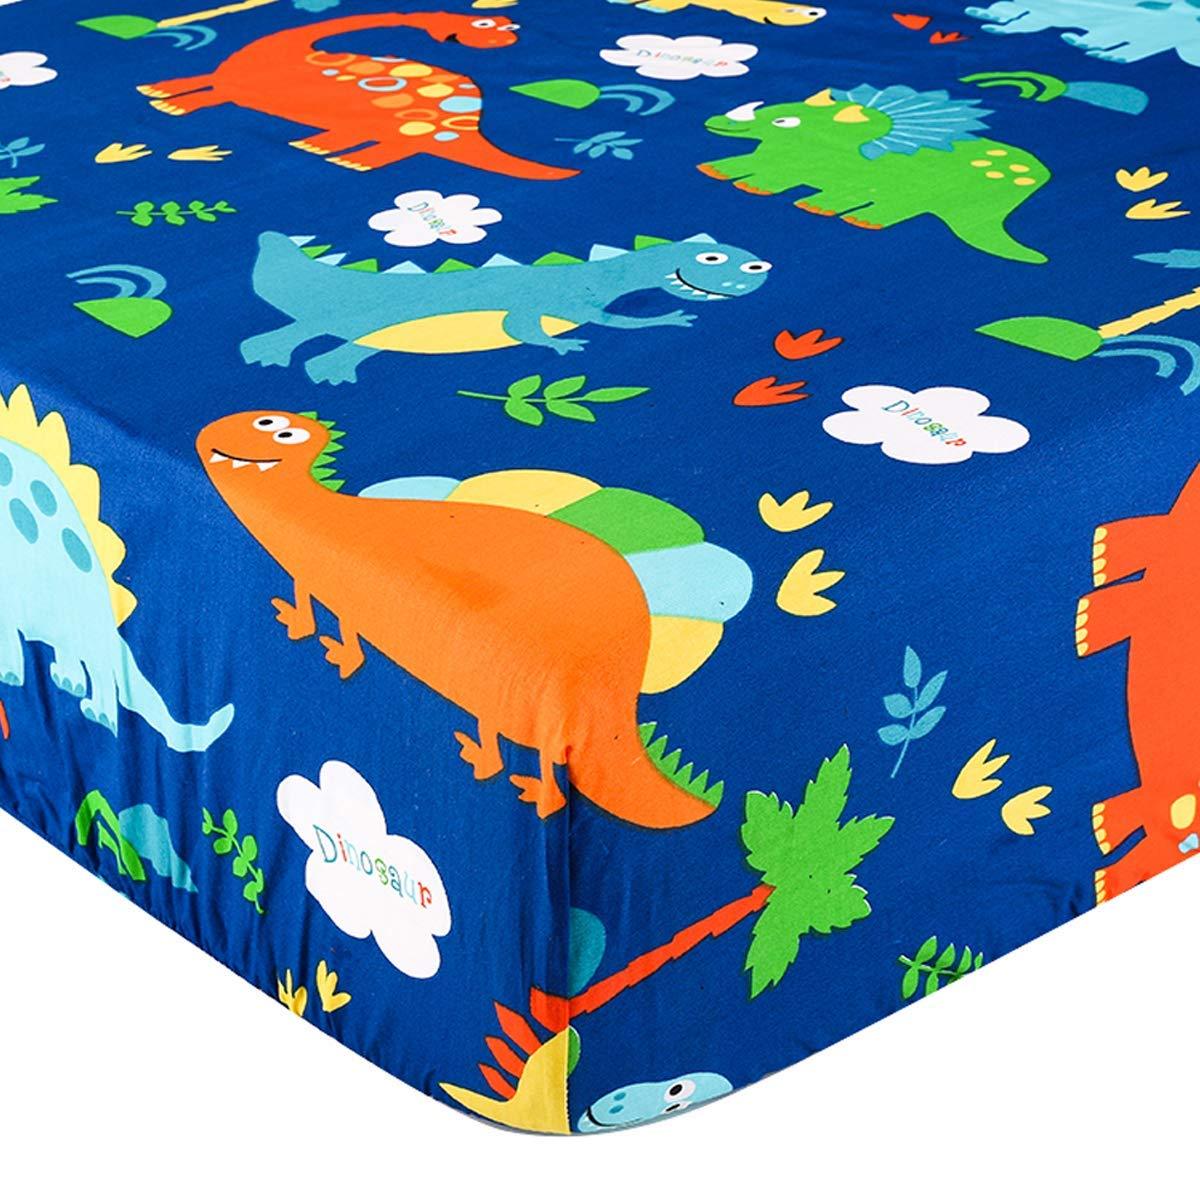 Crib Sheet Toddler Sheet 1 Pack 100% Cotton for Baby boy Dinosaur Pattern Crib Sheet by UOMNY